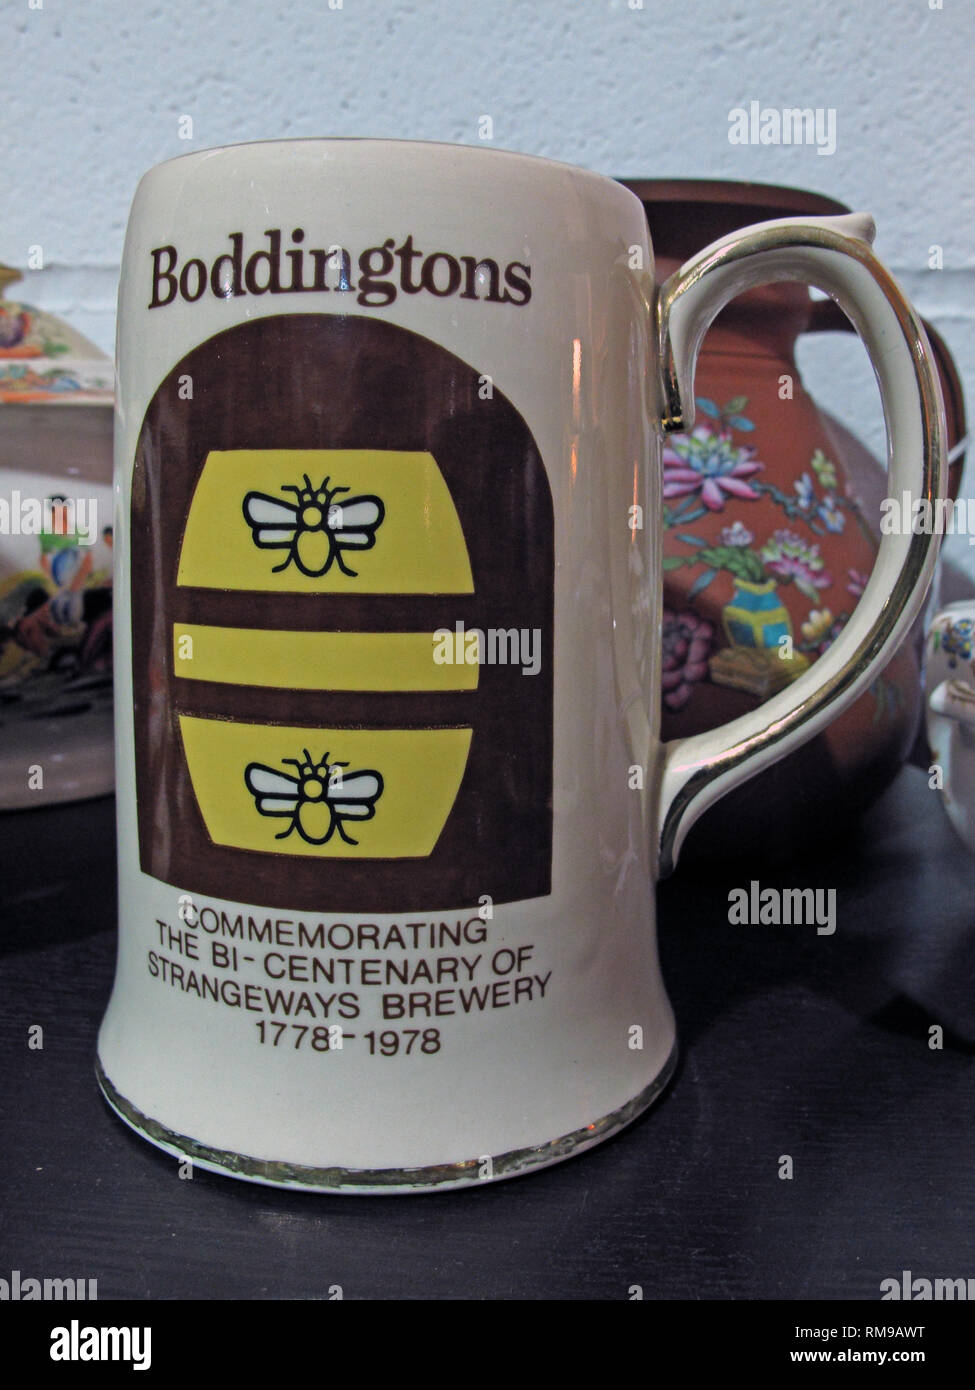 GoTonySmith,HotpixUK,@HotpixUK,England,UK,GB,Boddingtons,ber,ale,brewery,Boddingtons